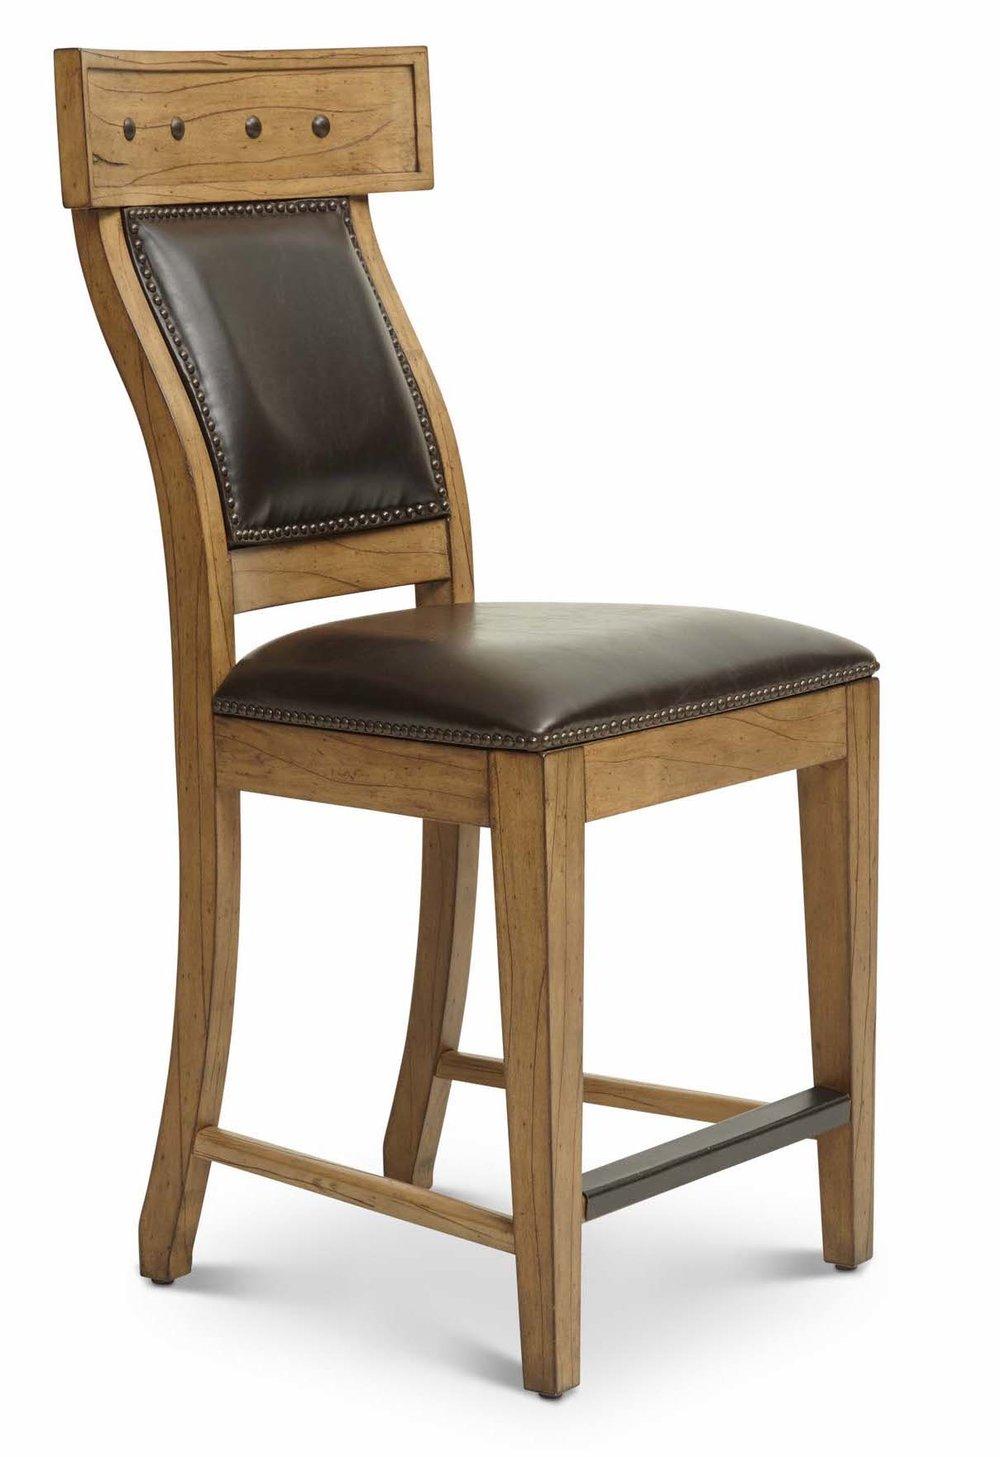 "Aspen Counter Stool Upholstered Back  Item # DI-167212 (G / LB / DB) Dimensions:20 x 23 x 43.75""H"